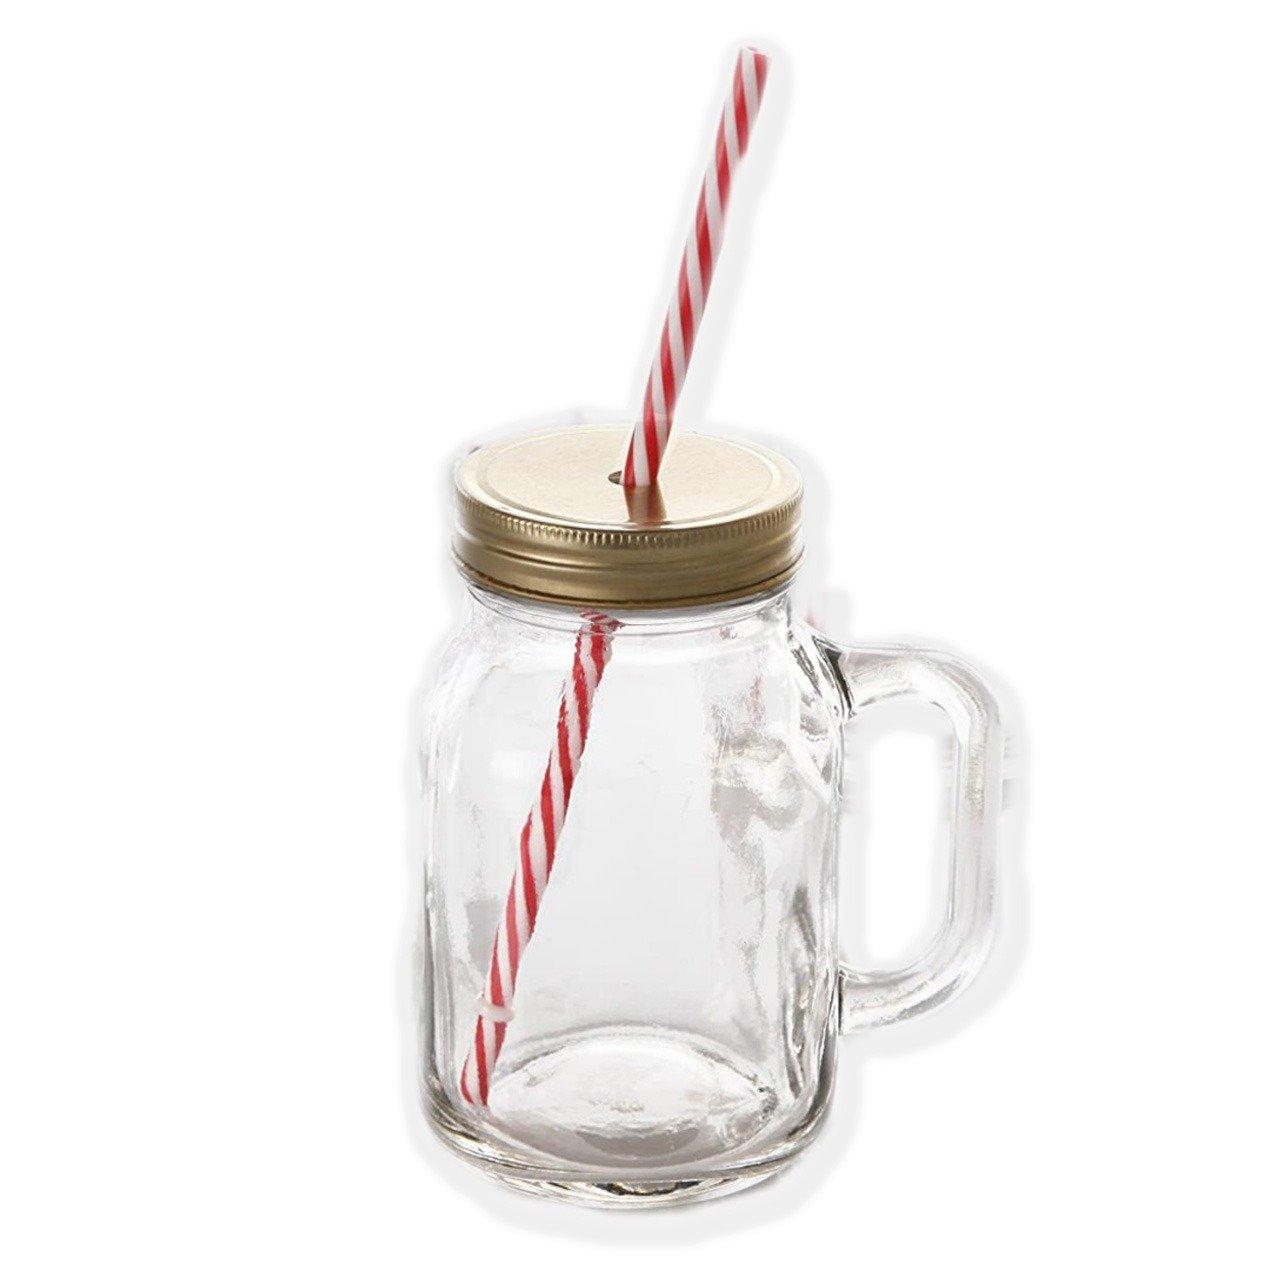 Drinking Cup/Glass/Mug Mason Jar with Handle & Straw - Unnati Enterprises